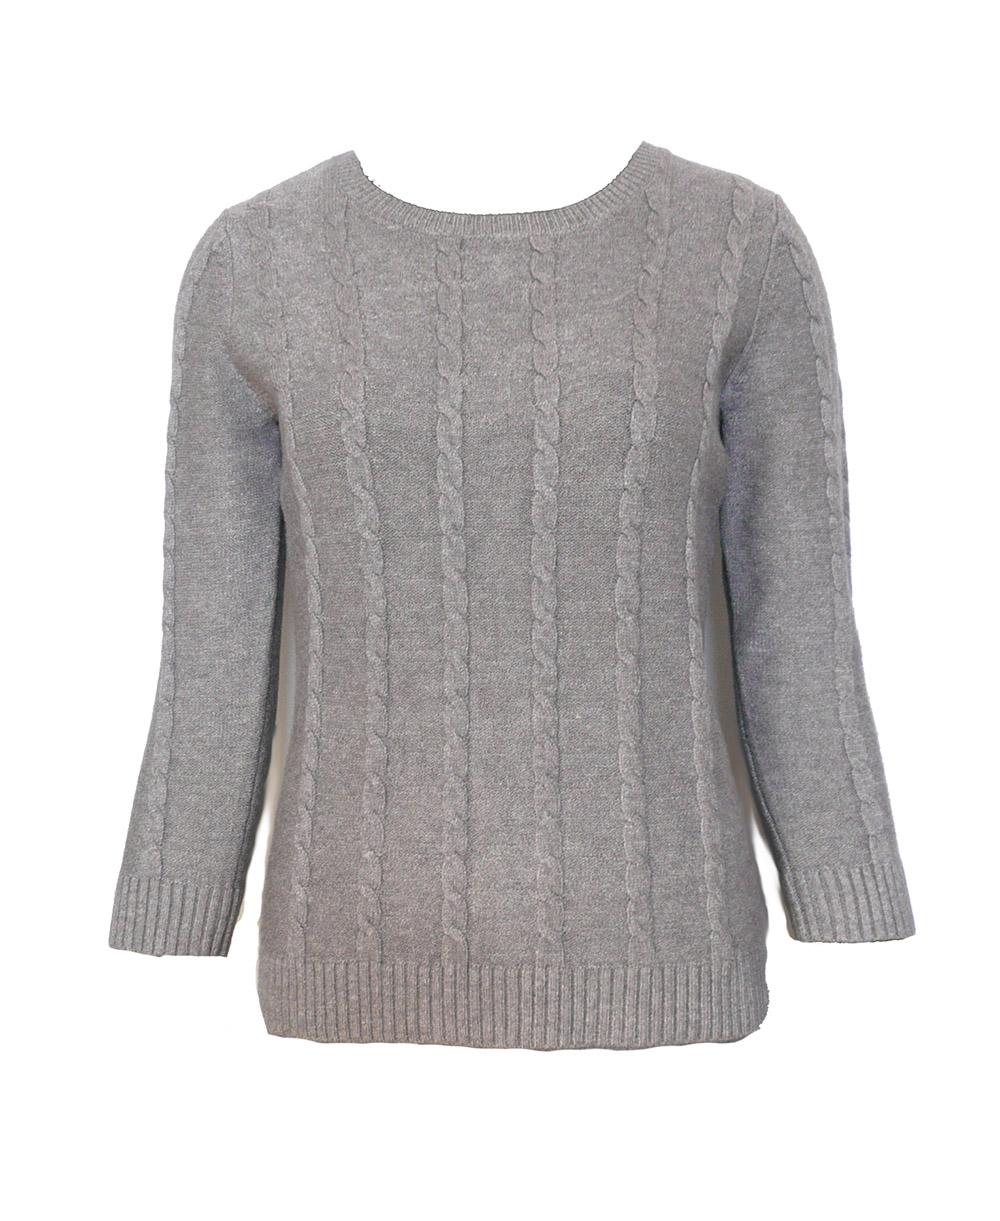 knit cable jewel nck.jpg